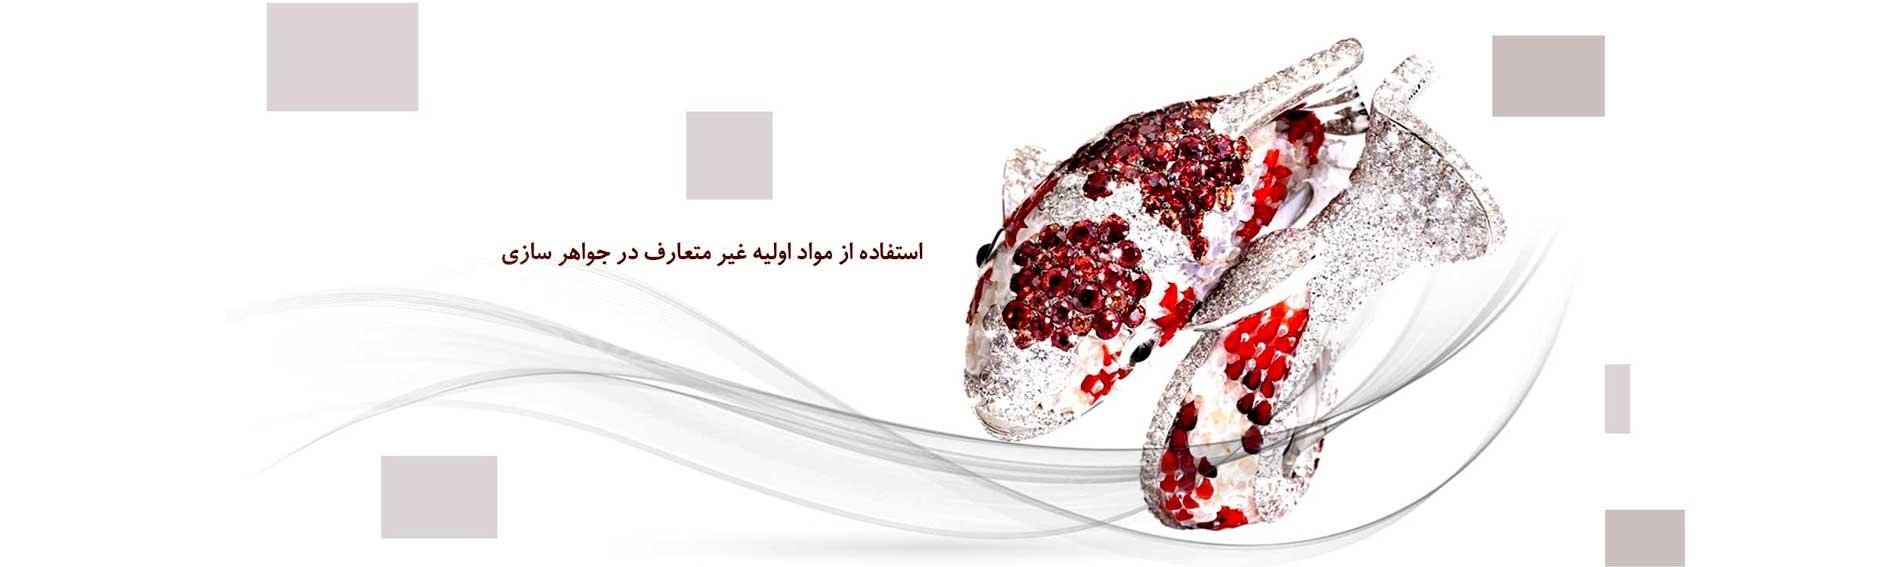 Jewellery designers 999 - استفاده از مواد اولیه غیر متعارف در جواهر سازی